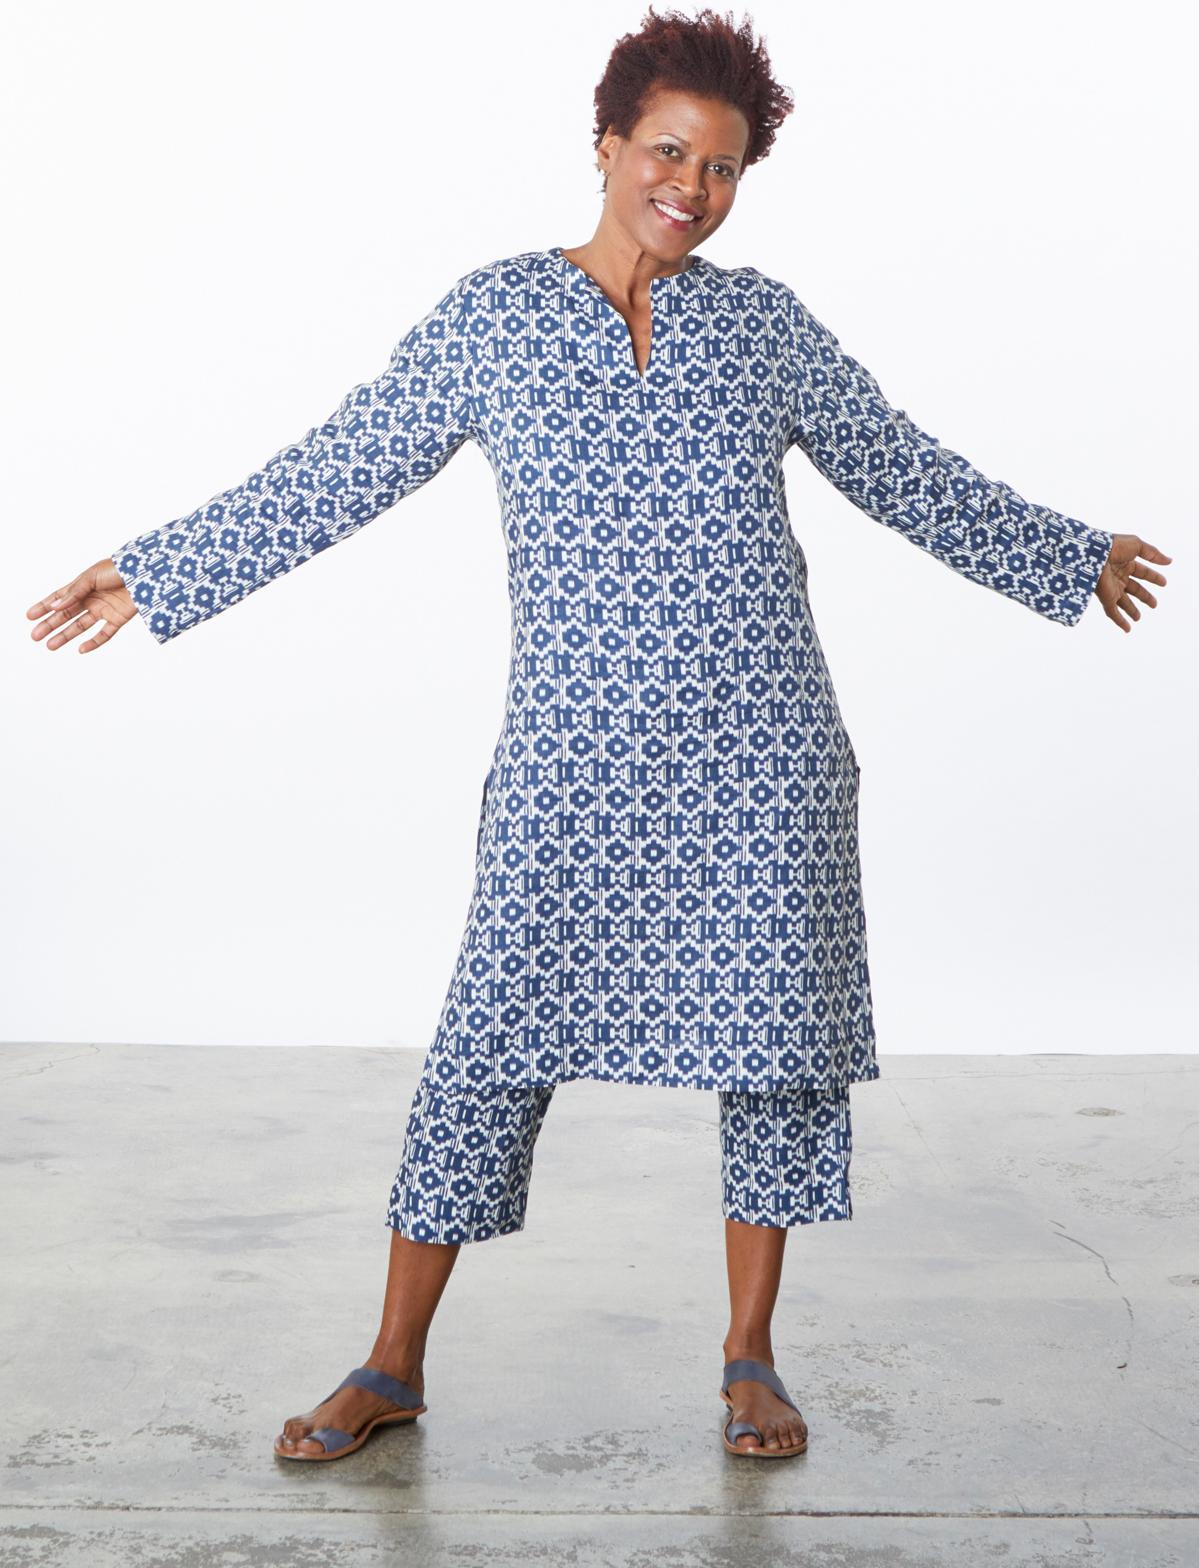 Risa Tunic, Capri Pant in Blue/Ivory Italian Print Linen